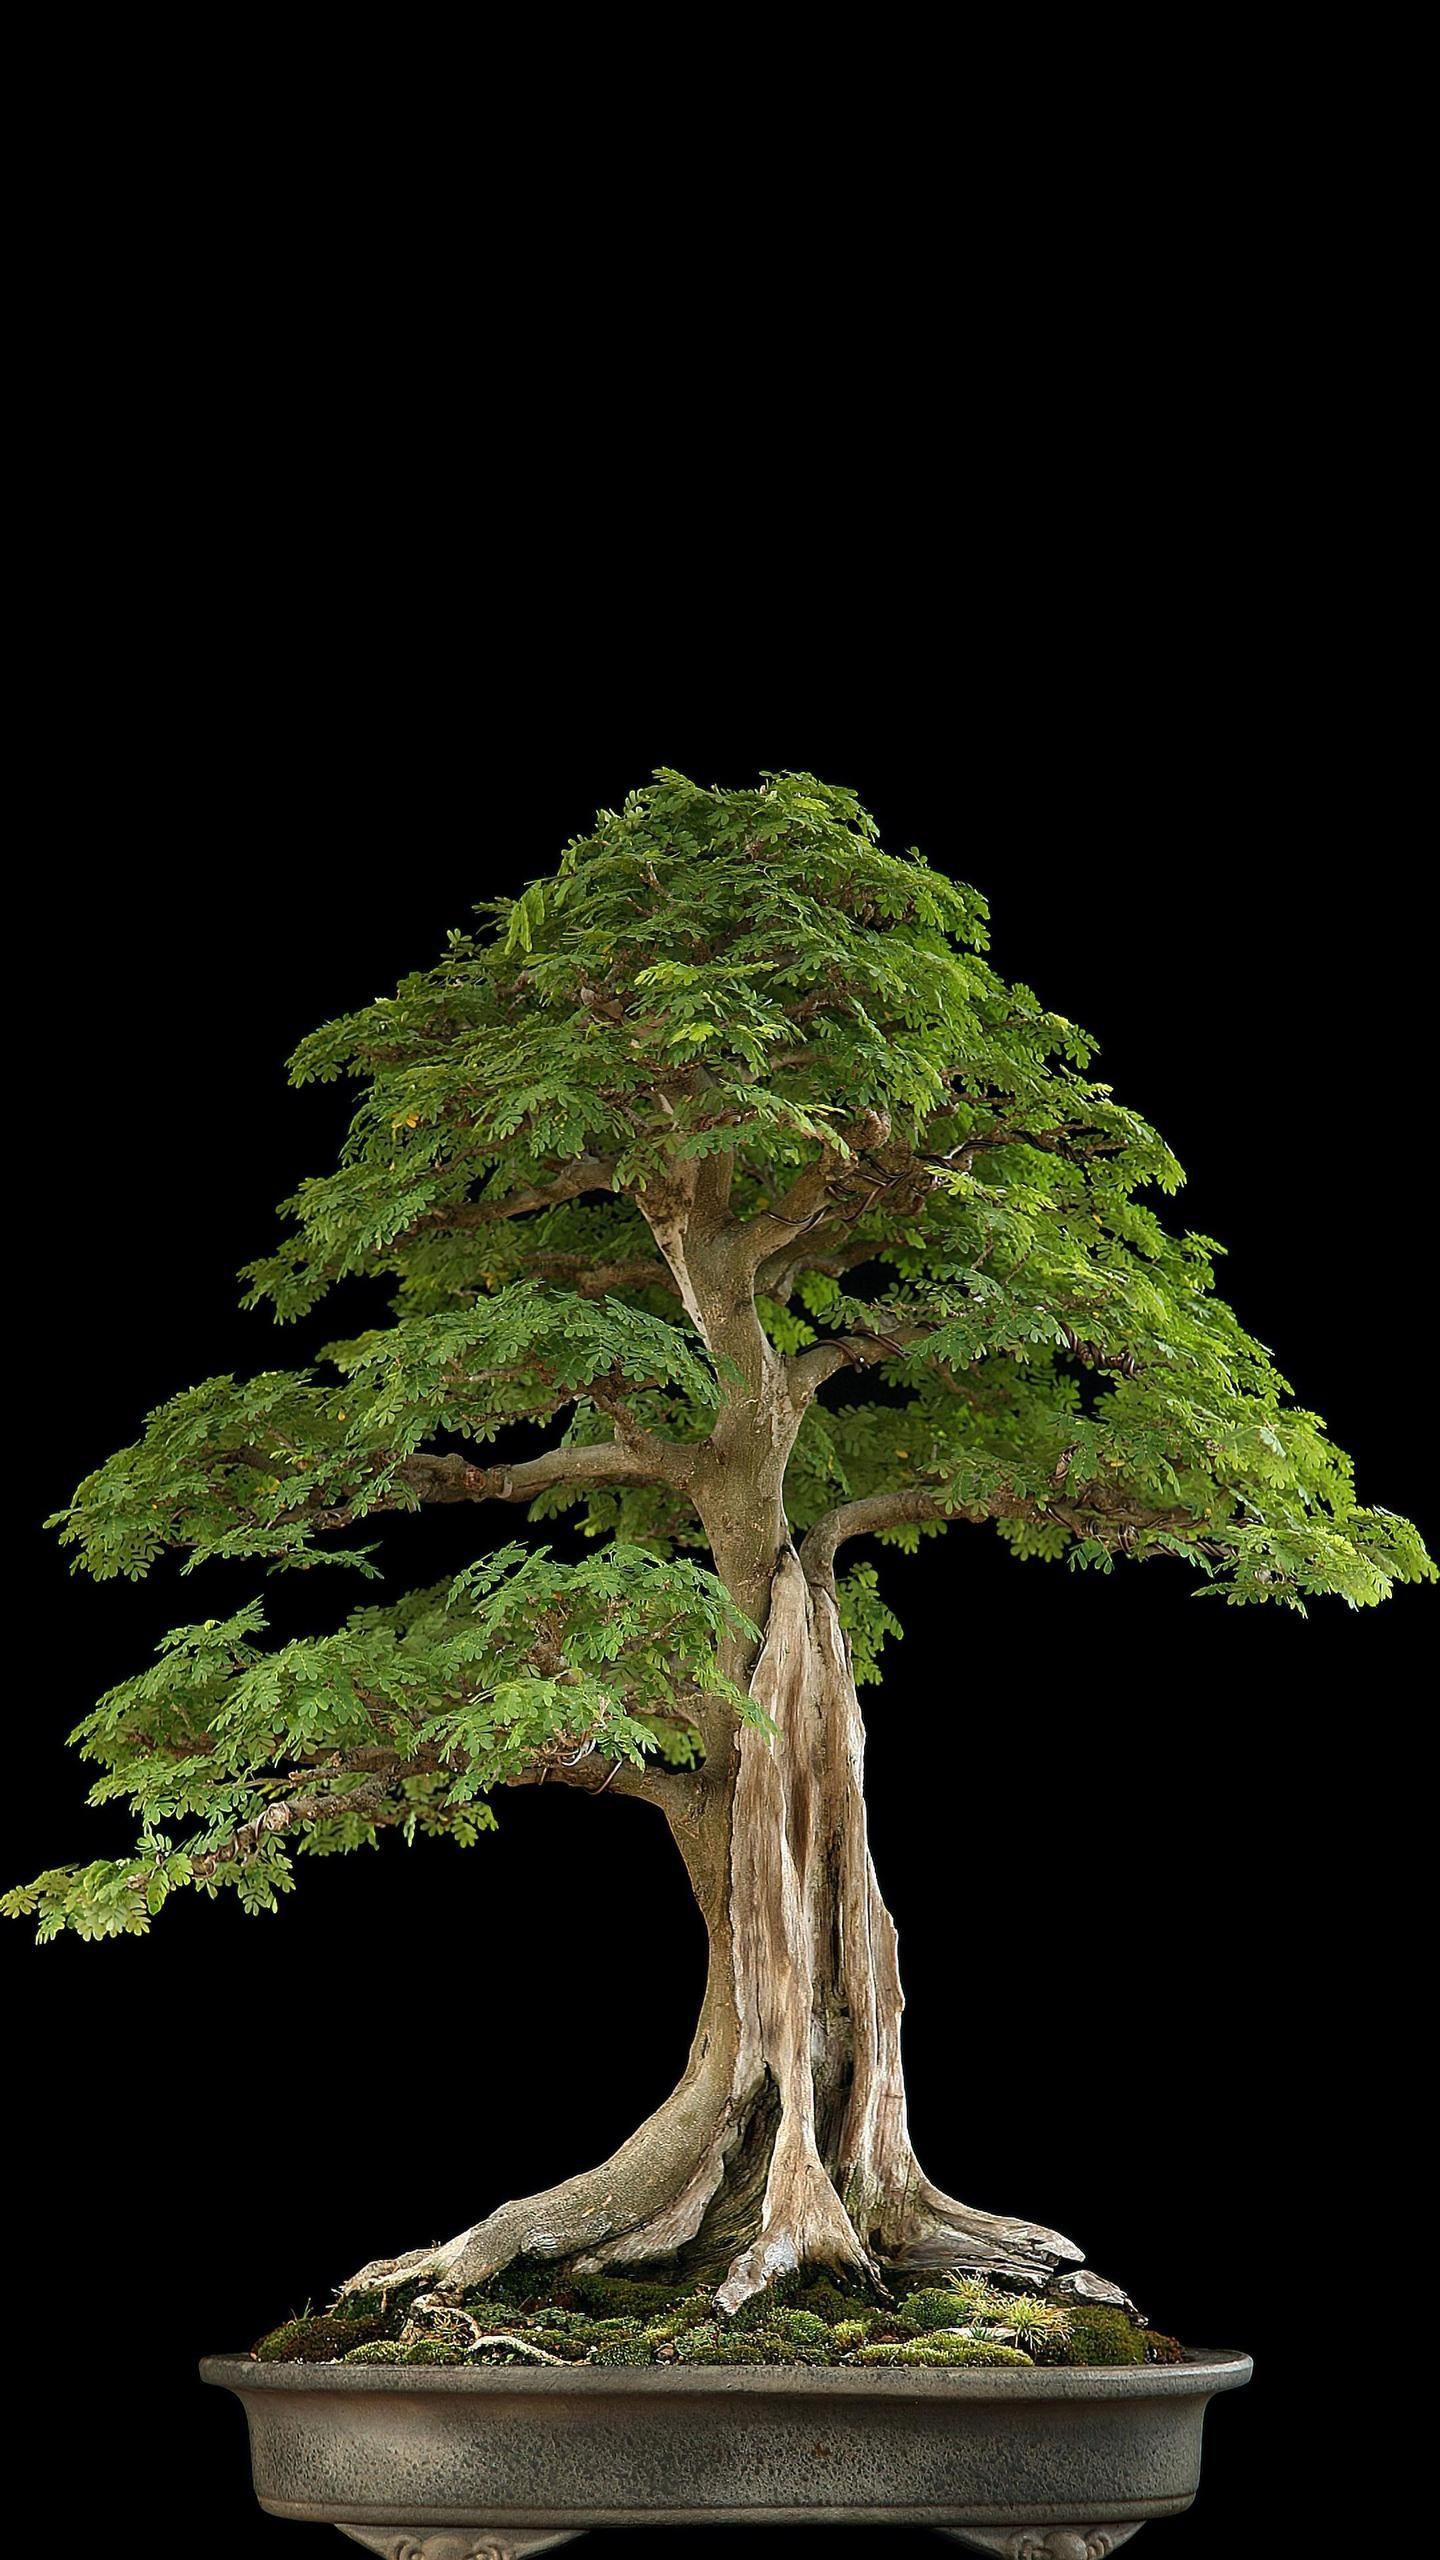 Bonsai Tree Wallpaper : bonsai, wallpaper, Bonsai, Types,, Tree,, Plants